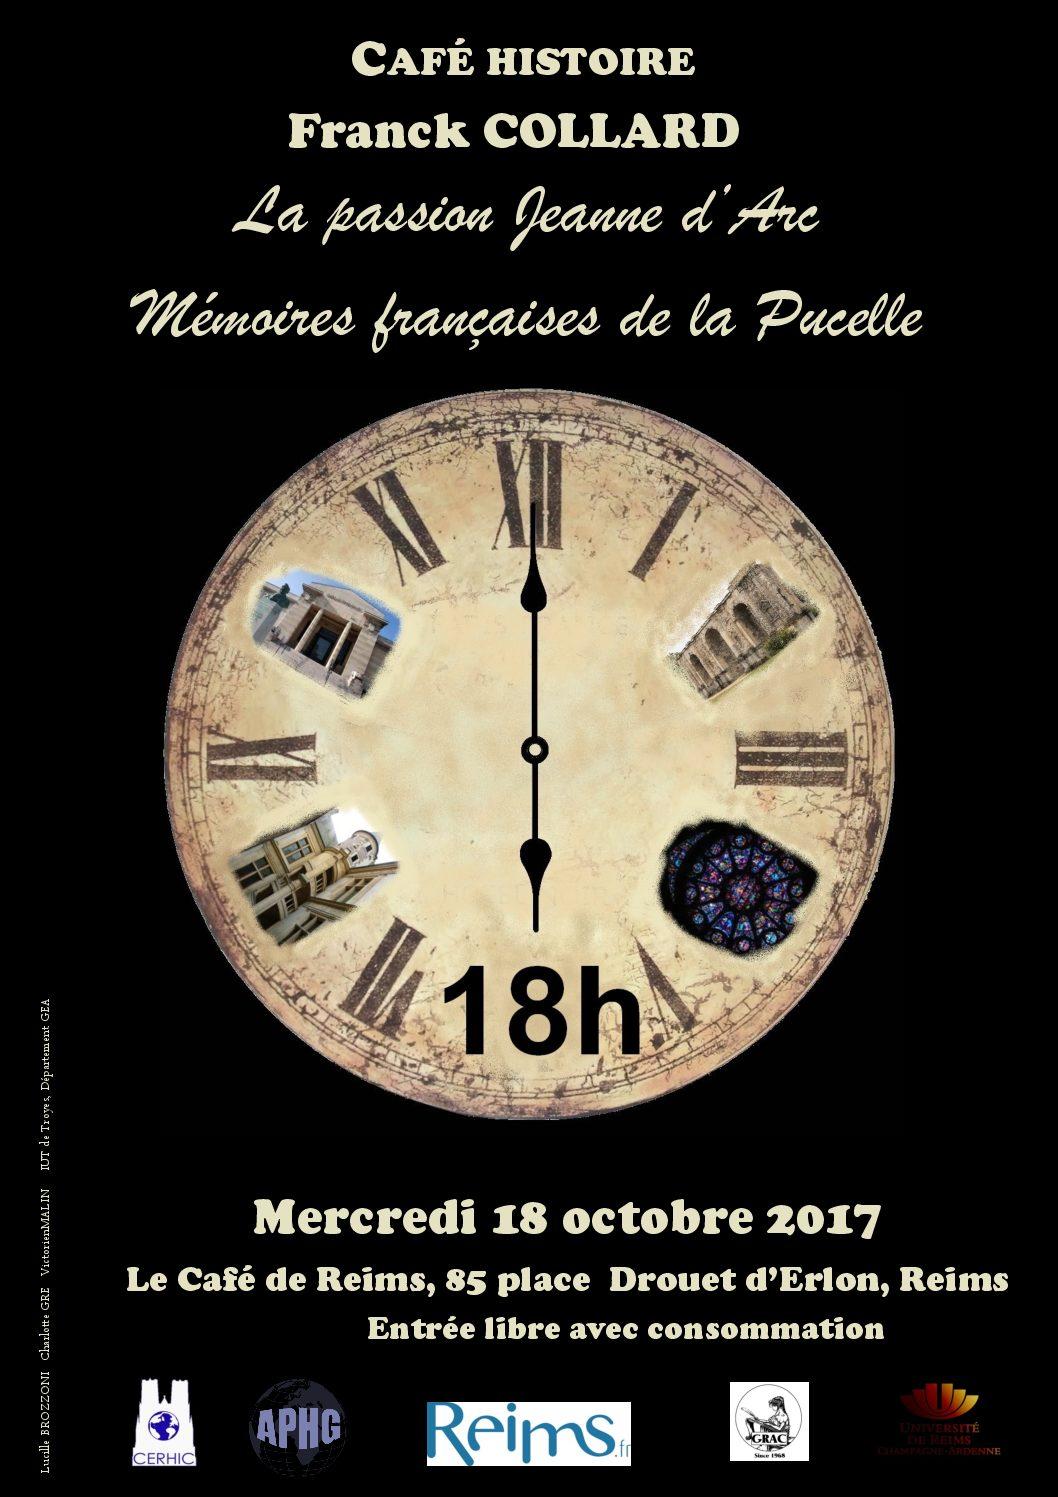 Prochain Café Histoire, mercredi 18 octobre 2017